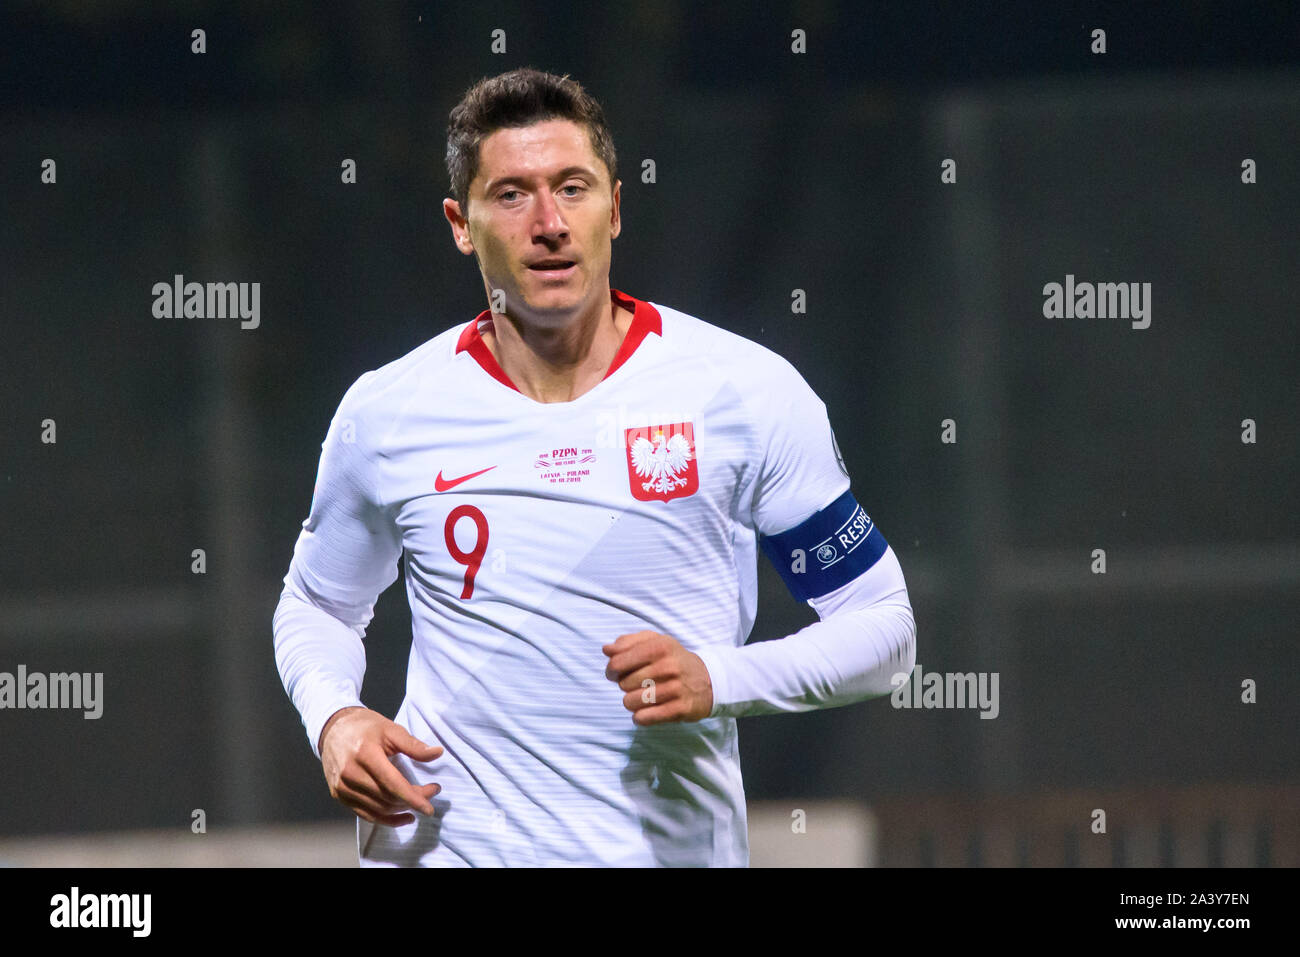 RIGA, LATVIA. 10th October, 2019. Robert Lewandowski, during UEFA EURO 2020 Qualification game between national football team of Latvia and team Poland. Credit: Gints Ivuskans/Alamy Live News Stock Photo